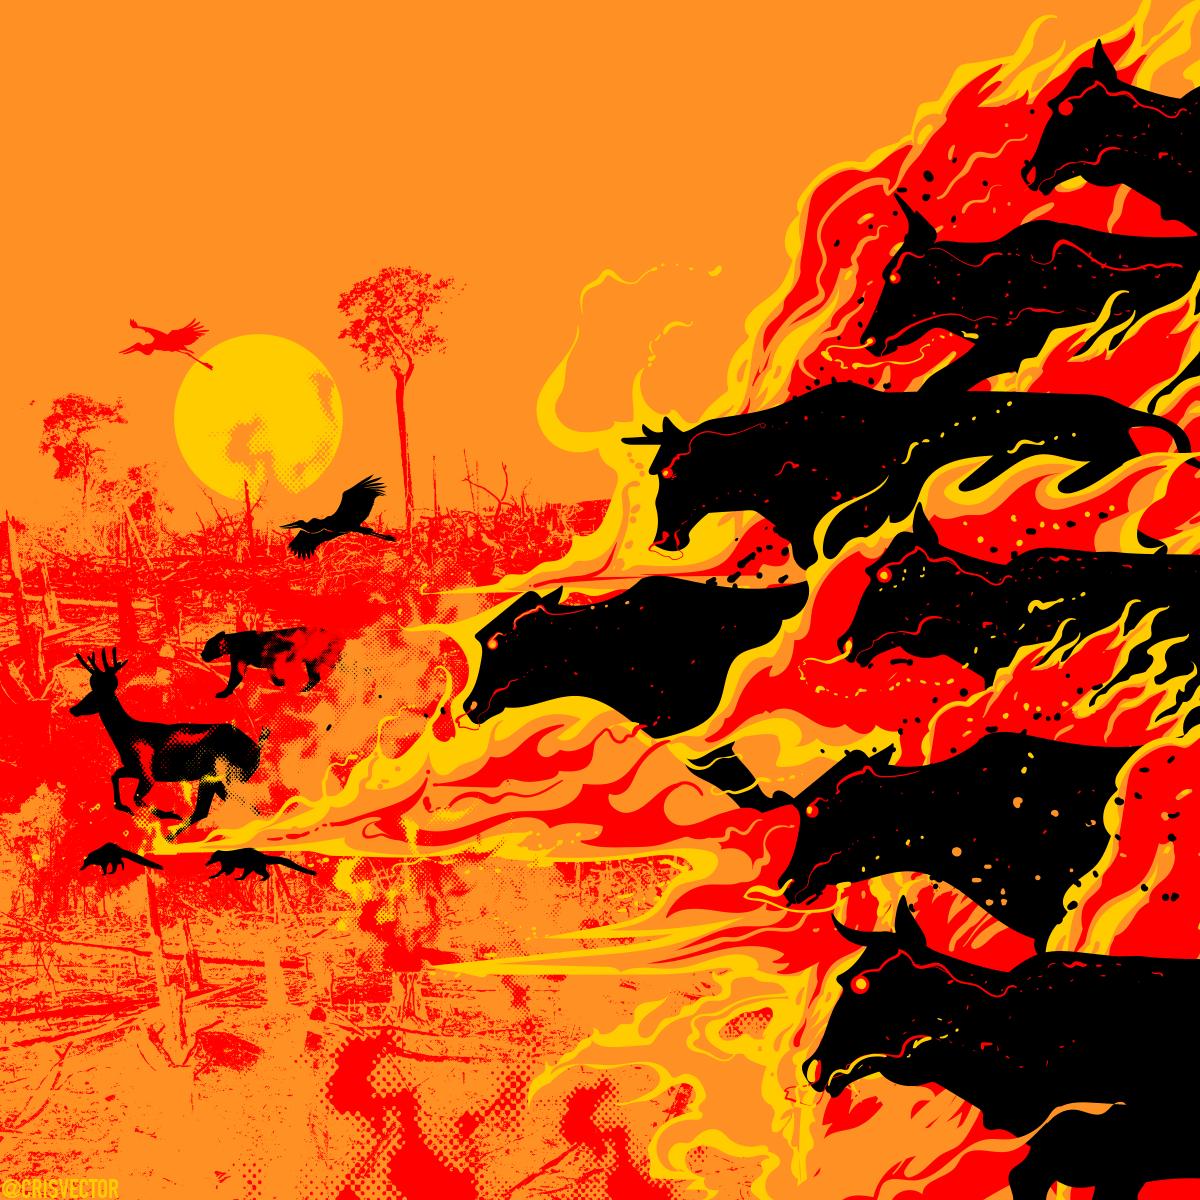 E a boiada continua passando sobre o Pantanal.   #PantanalEmChamas #IncêndioPantanal https://t.co/9FAIuOTYl4